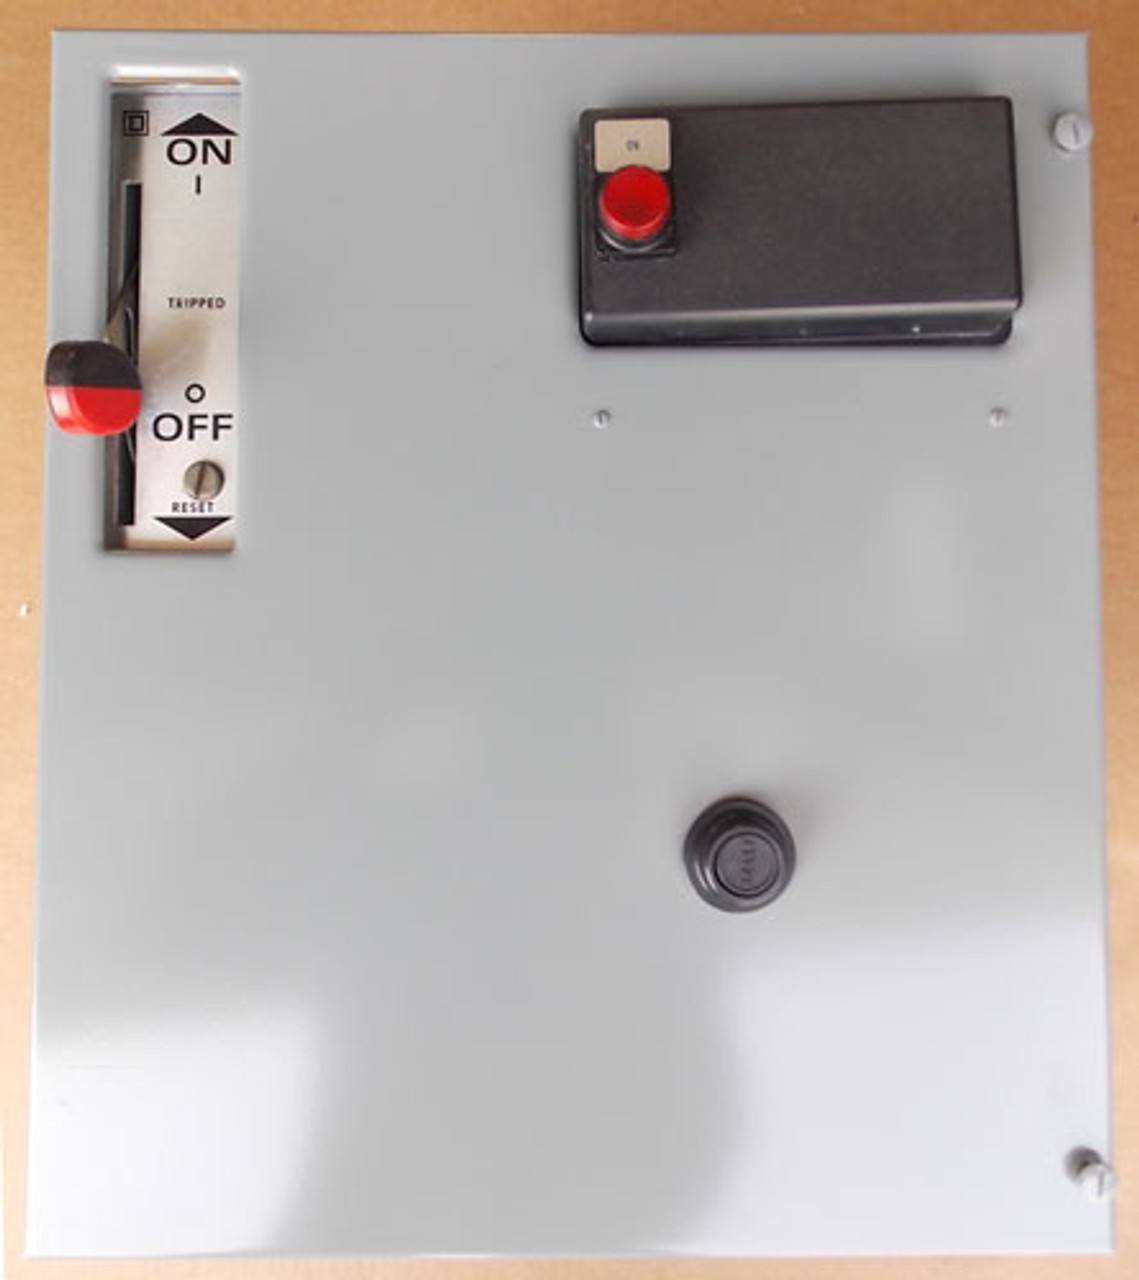 Square D Mod 5 Size 3 Motor Control Center Bucket 480V 3PH 120V Coil - Used